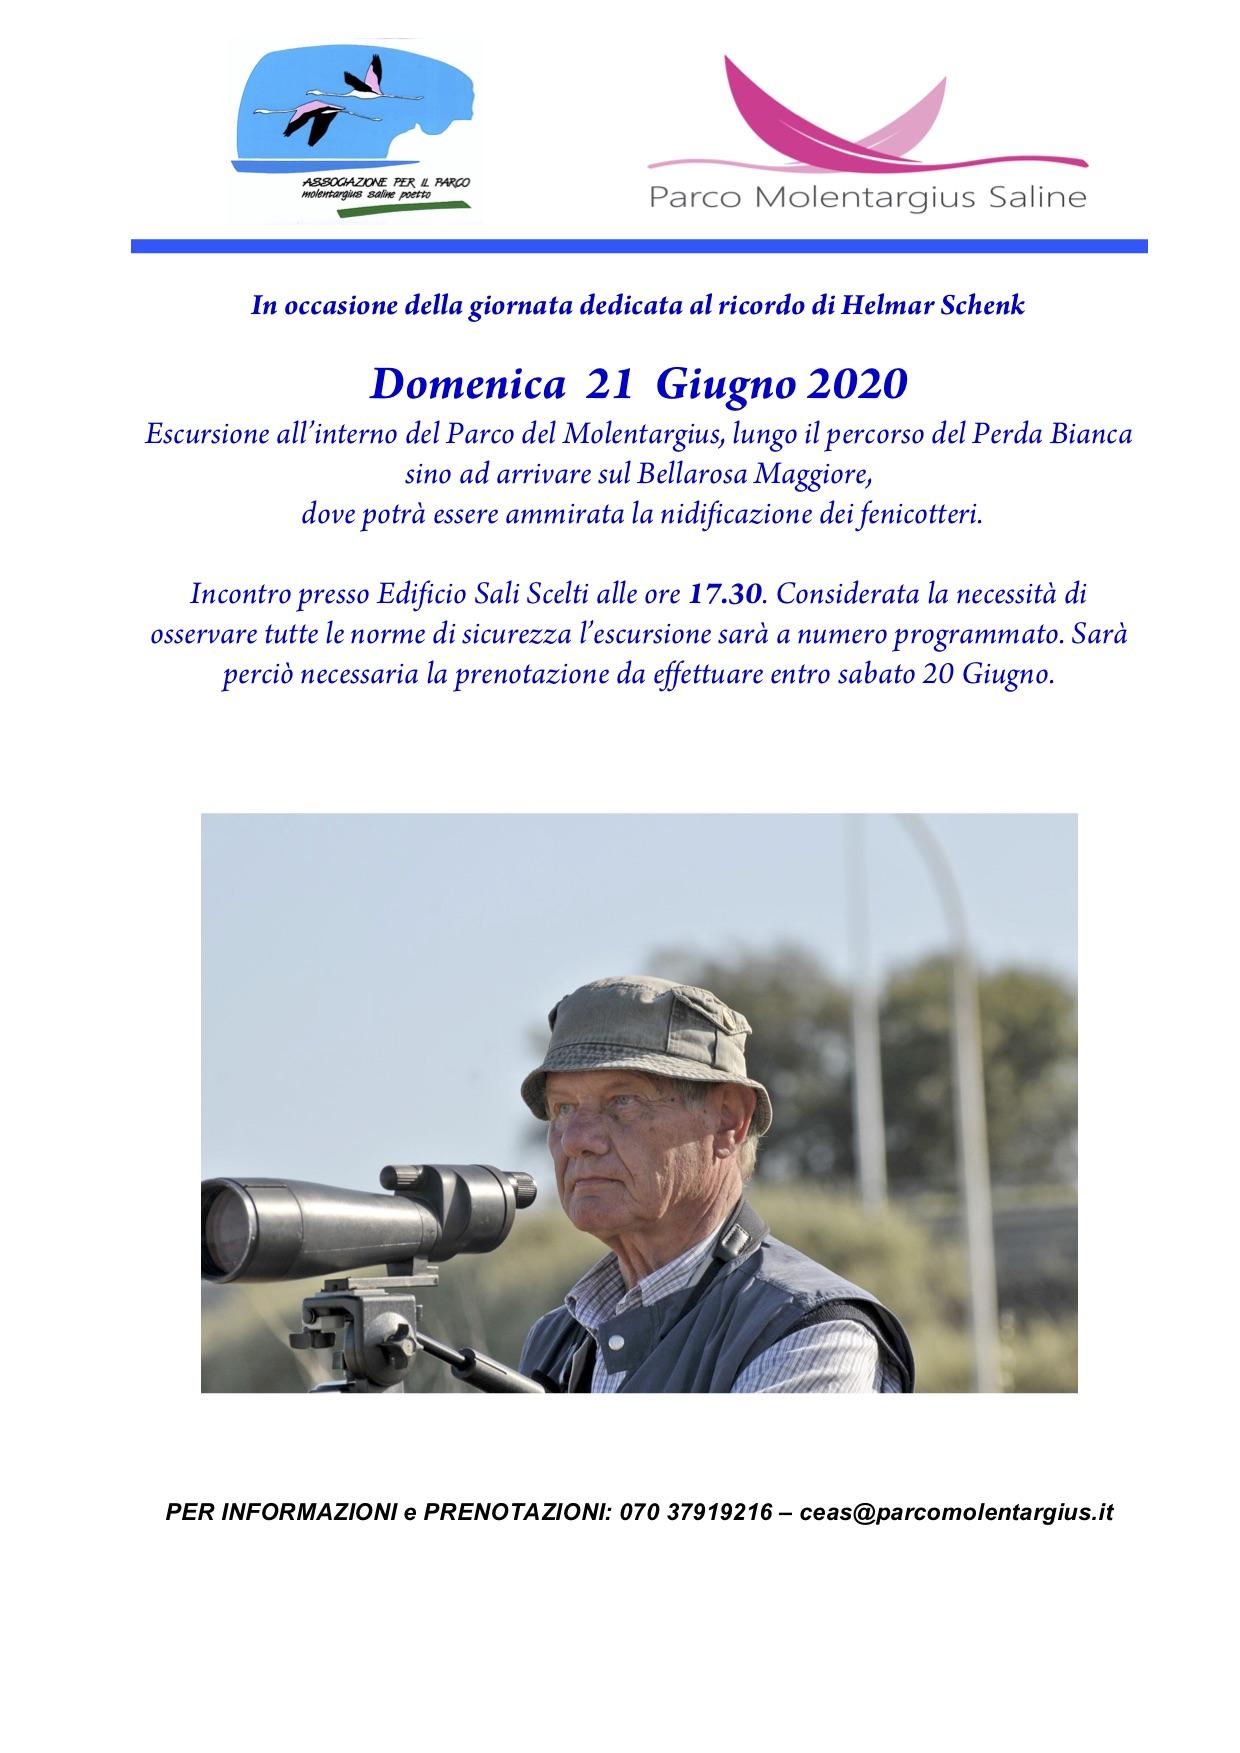 21 GIUGNO 2020 - locandina (1)